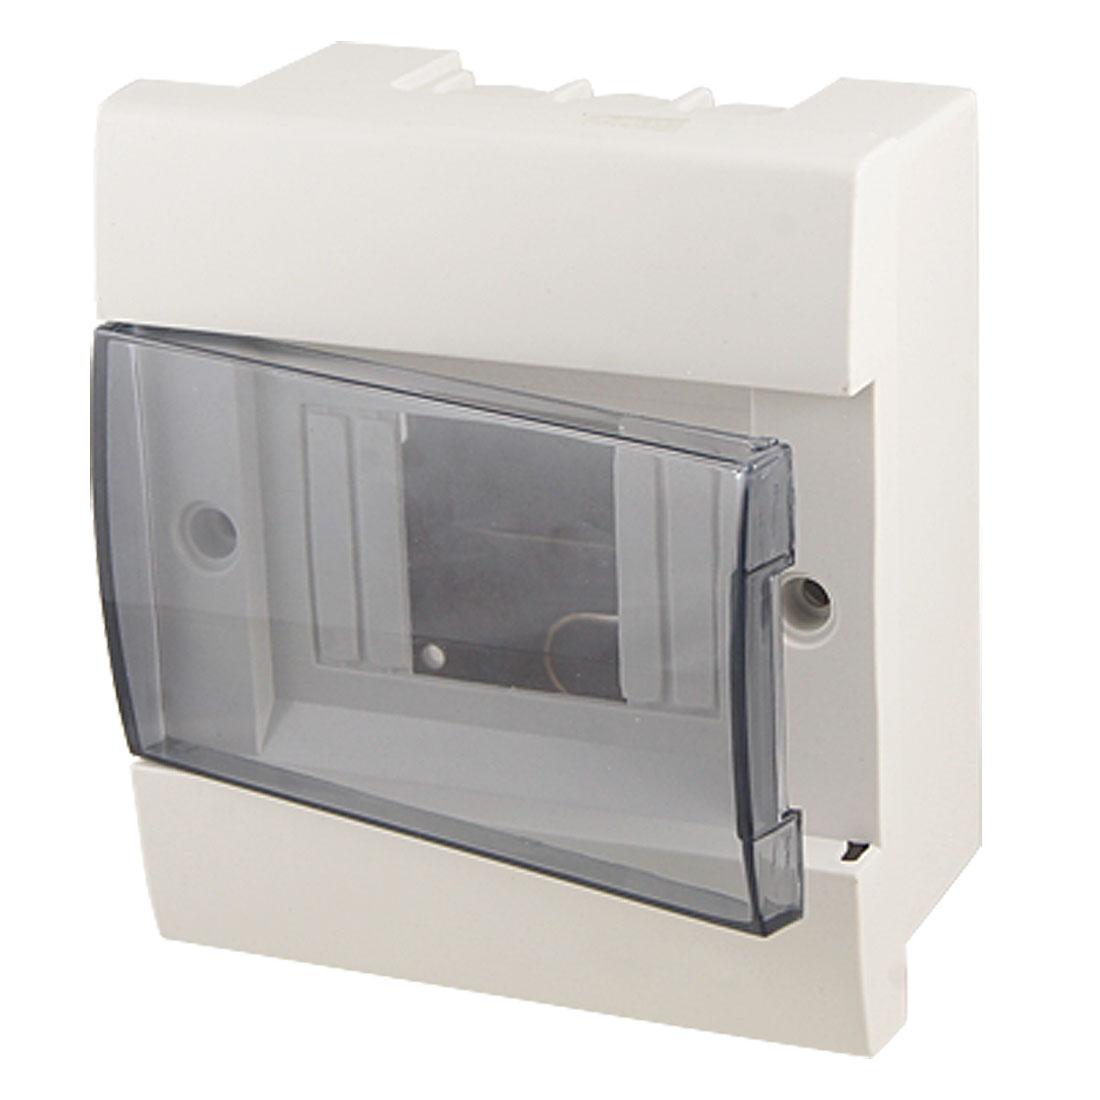 Plastic Miniature Circuit Breaker Housing Cover Case White